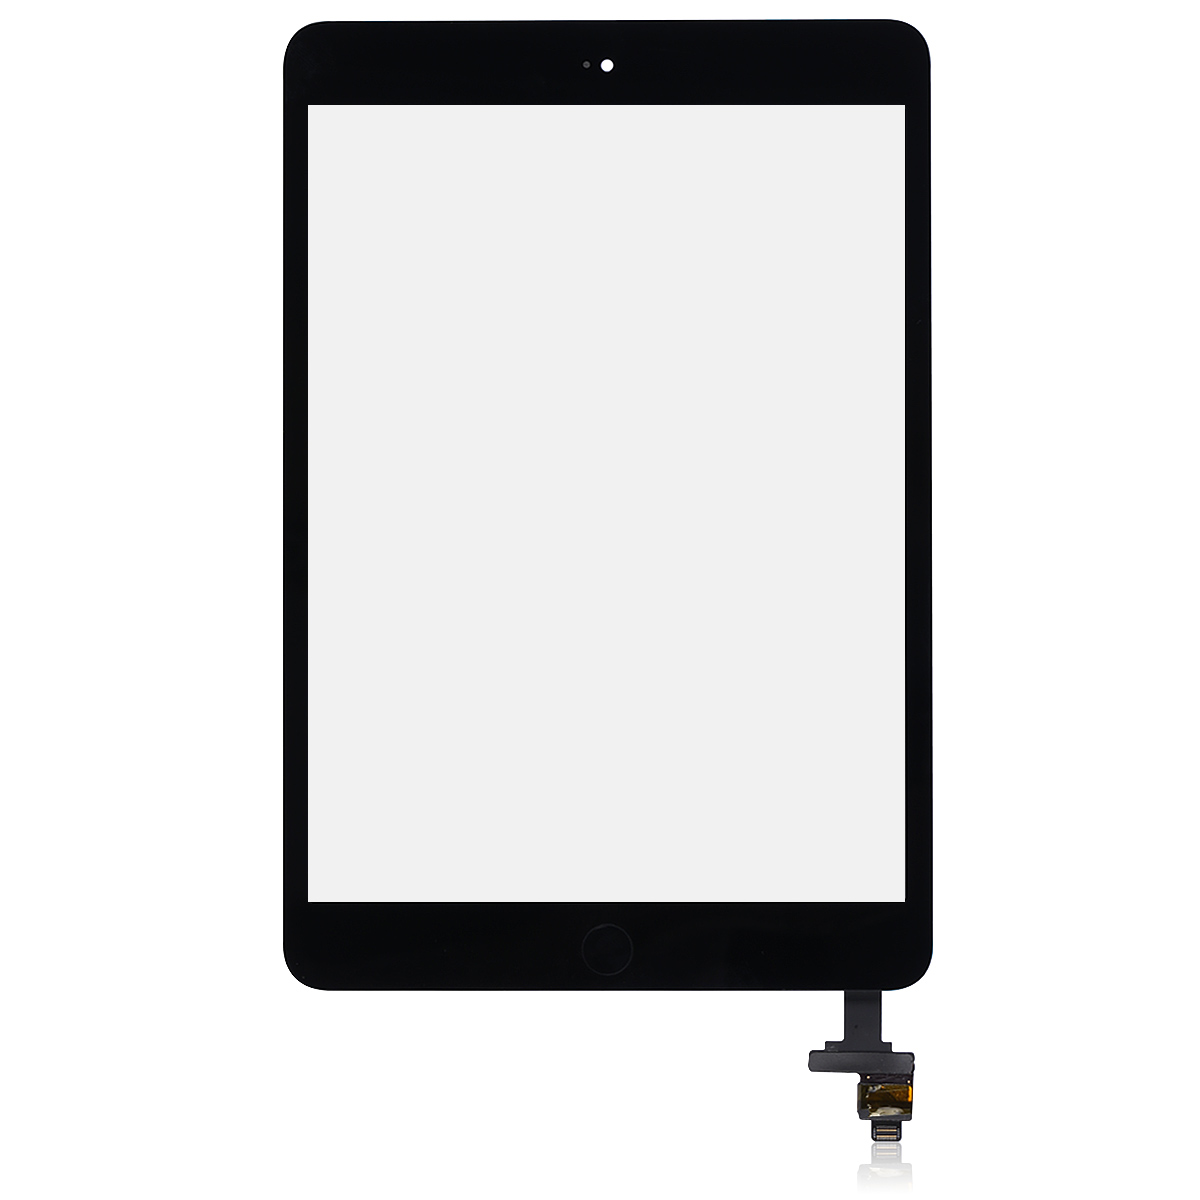 Digitizer For Ipad Mini 1 Ipad Mini 2 Ipad Repair Parts